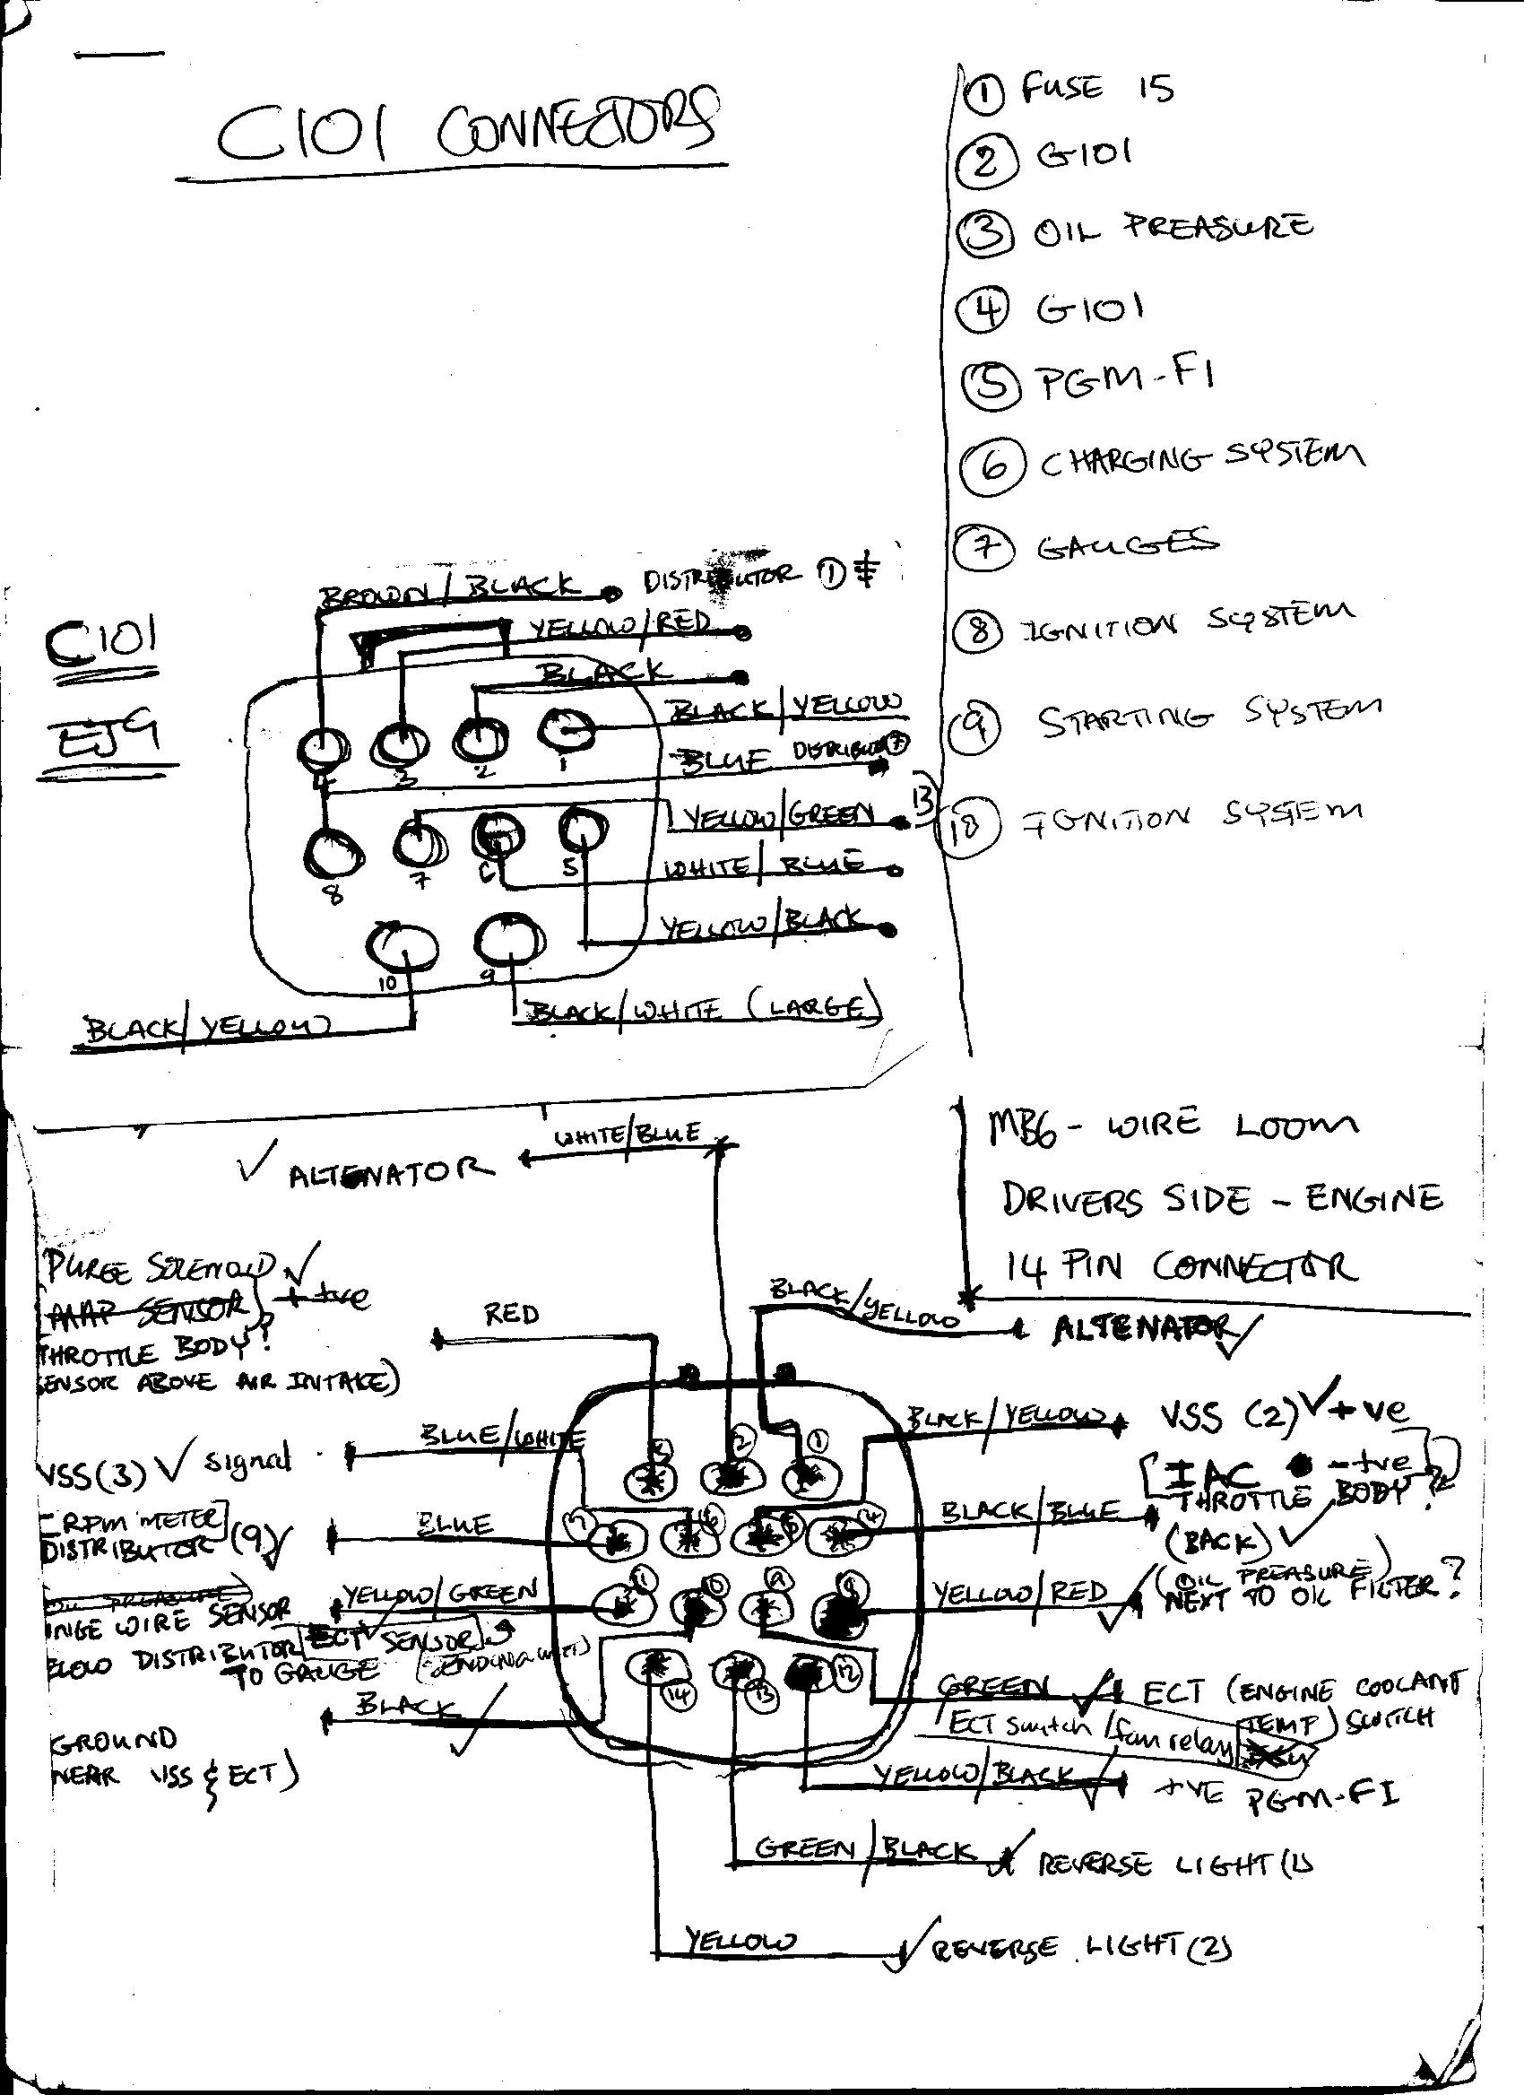 99 Civic Engine Diagram B18c4 Into 1 4 Ej9 Help Please Of 99 Civic Engine Diagram